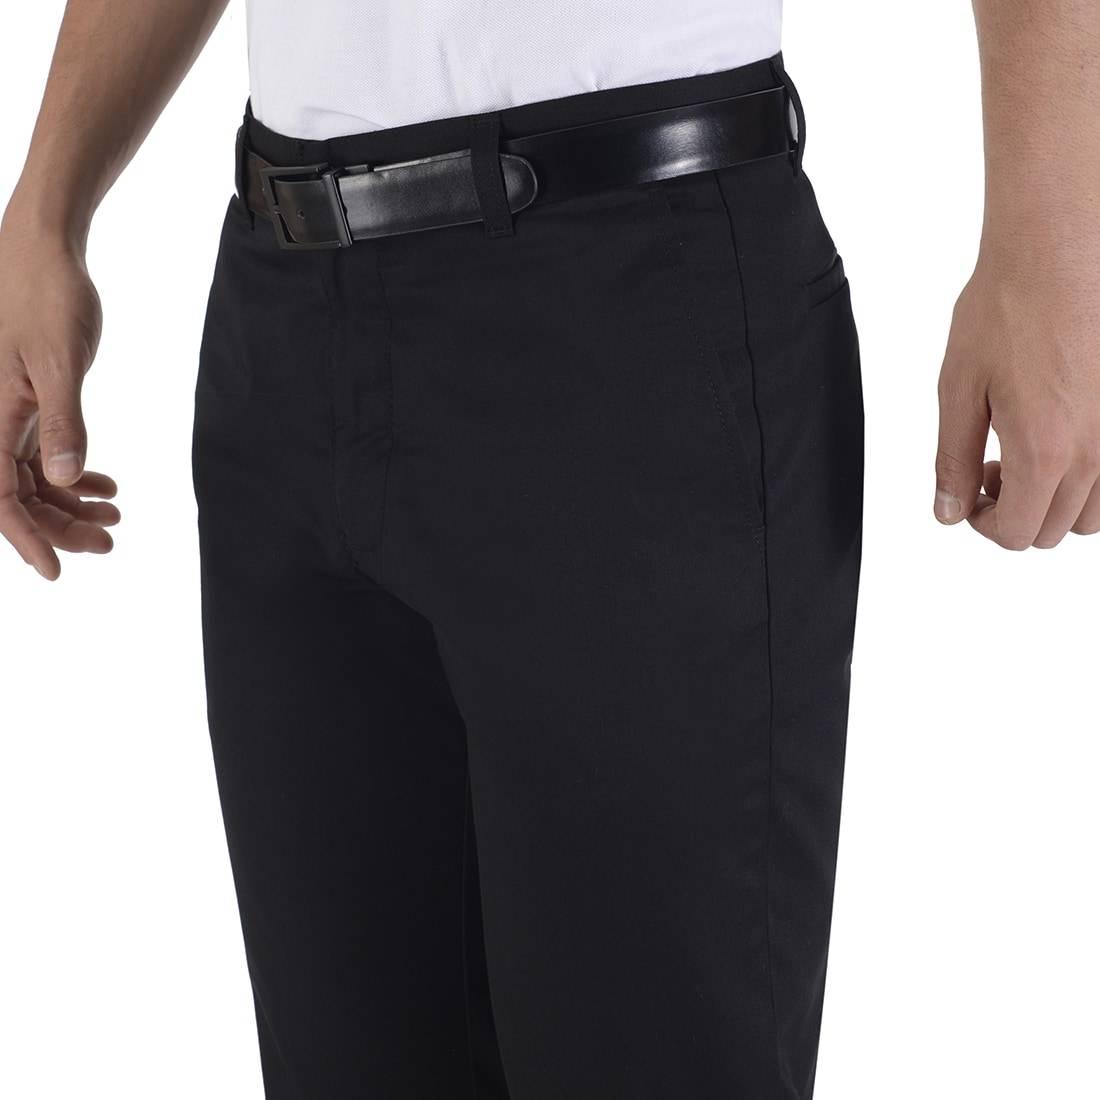 010920418909-03-Pantalon-Casual-Slim-Fit-Negro-yale